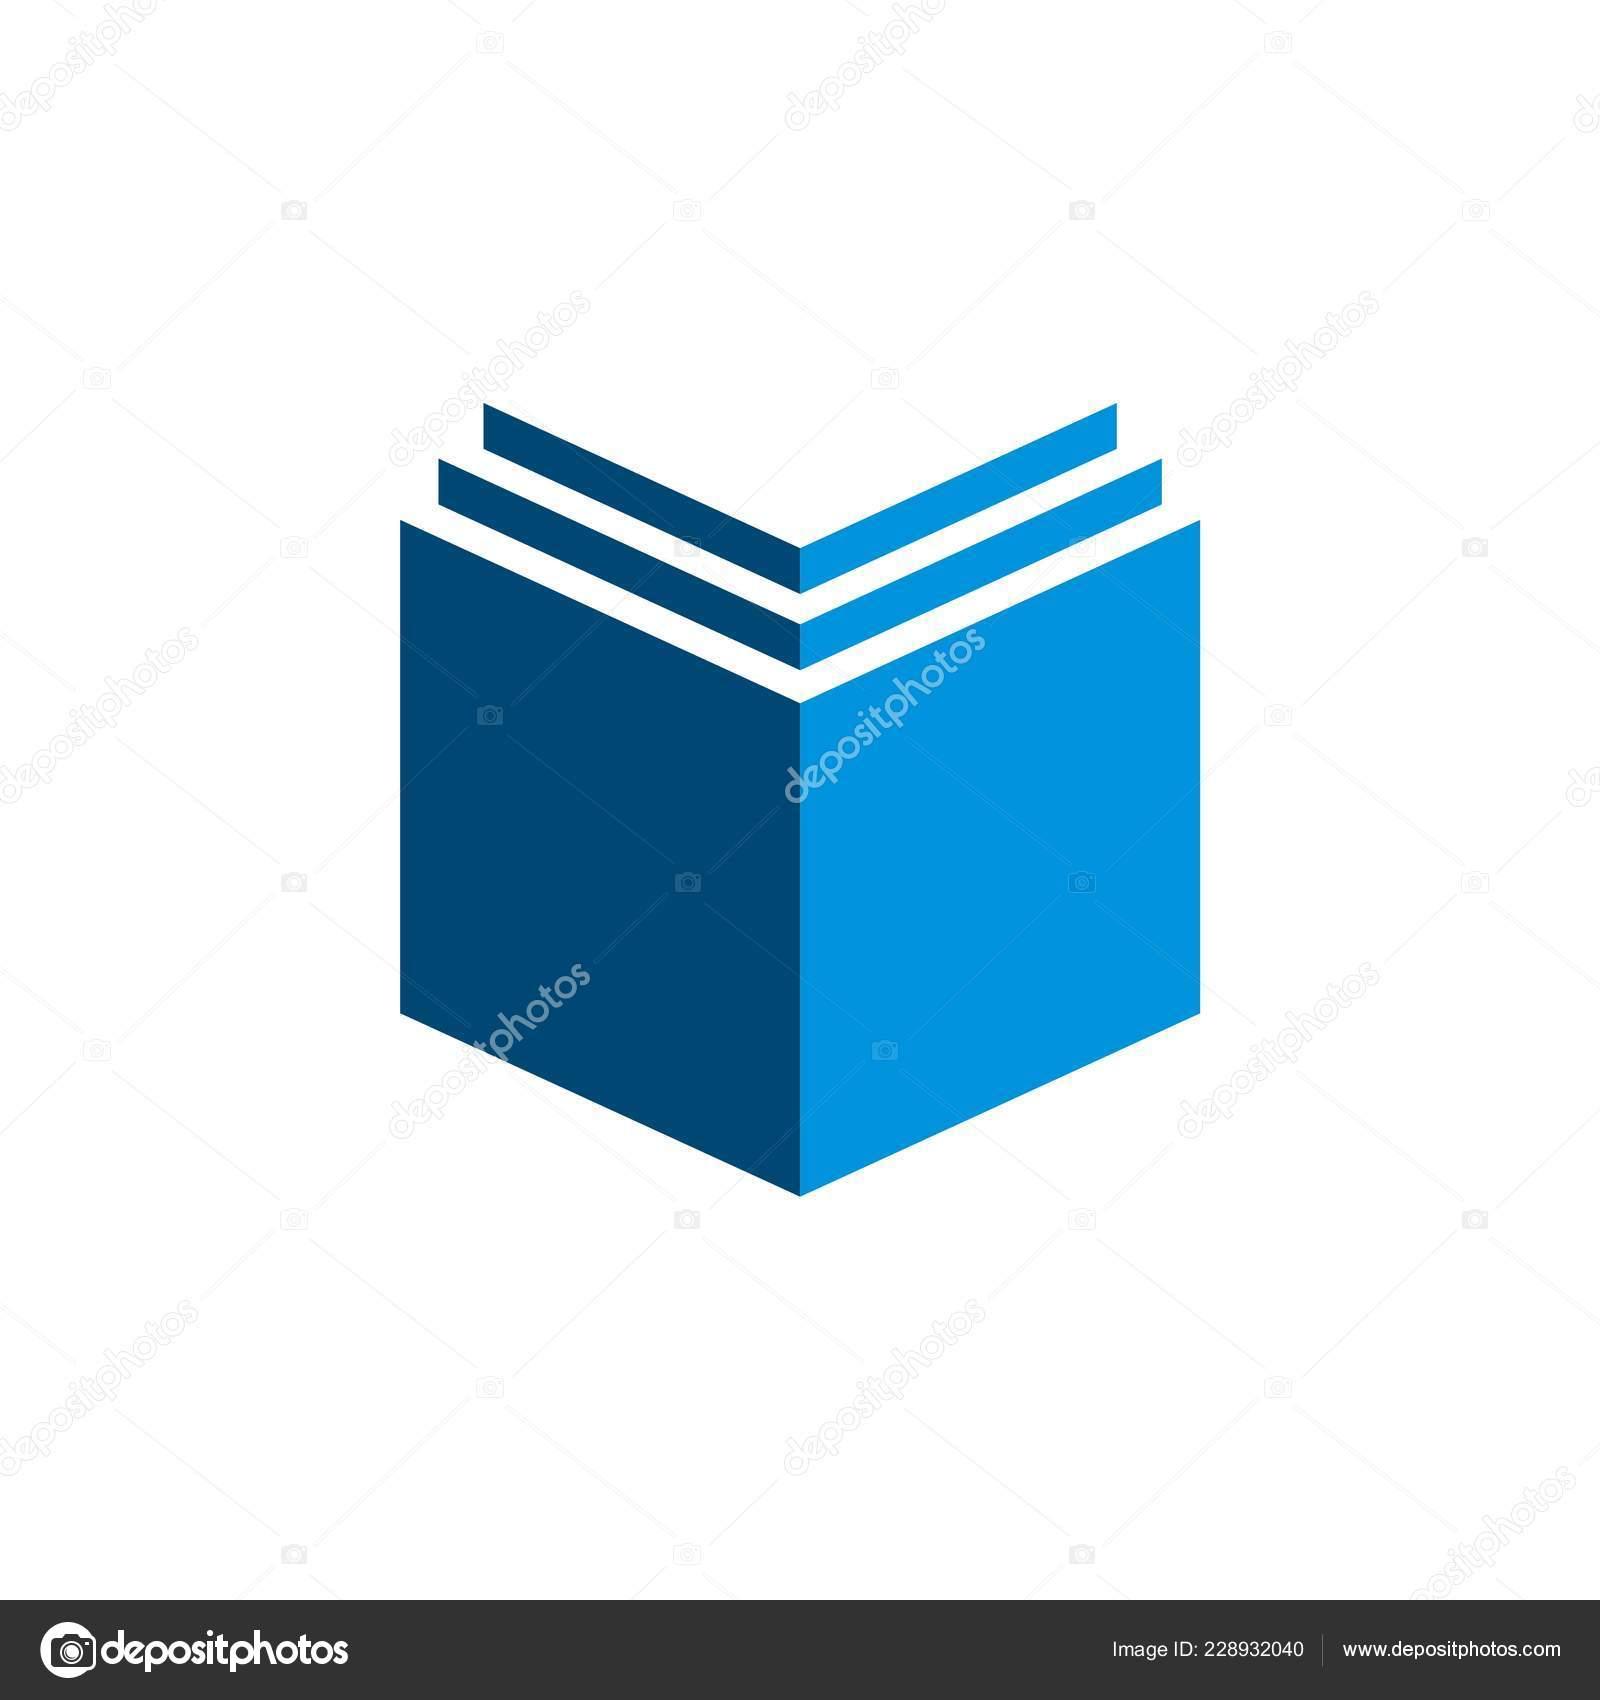 Modele Logo Livre Bleu Image Vectorielle Soponyono